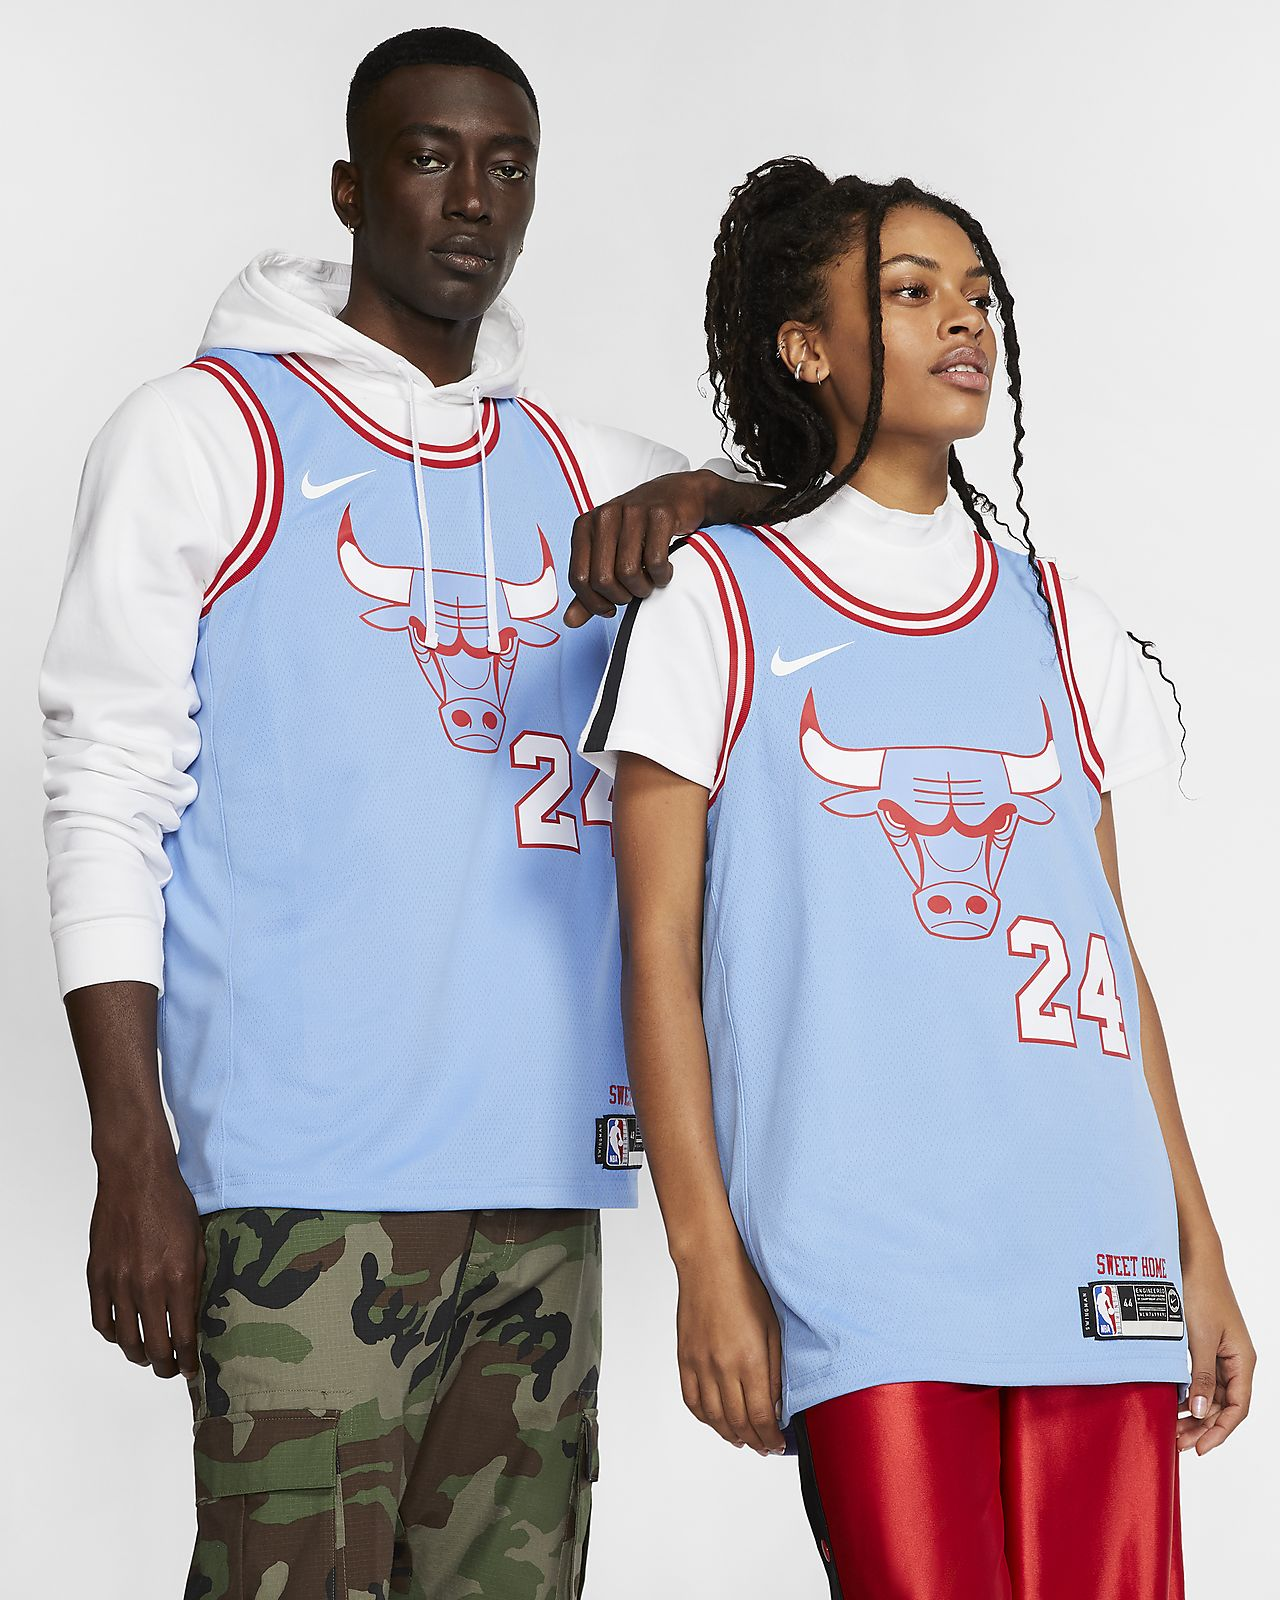 Maglia Lauri Markkanen Bulls – City Edition Swingman Nike NBA - Uomo